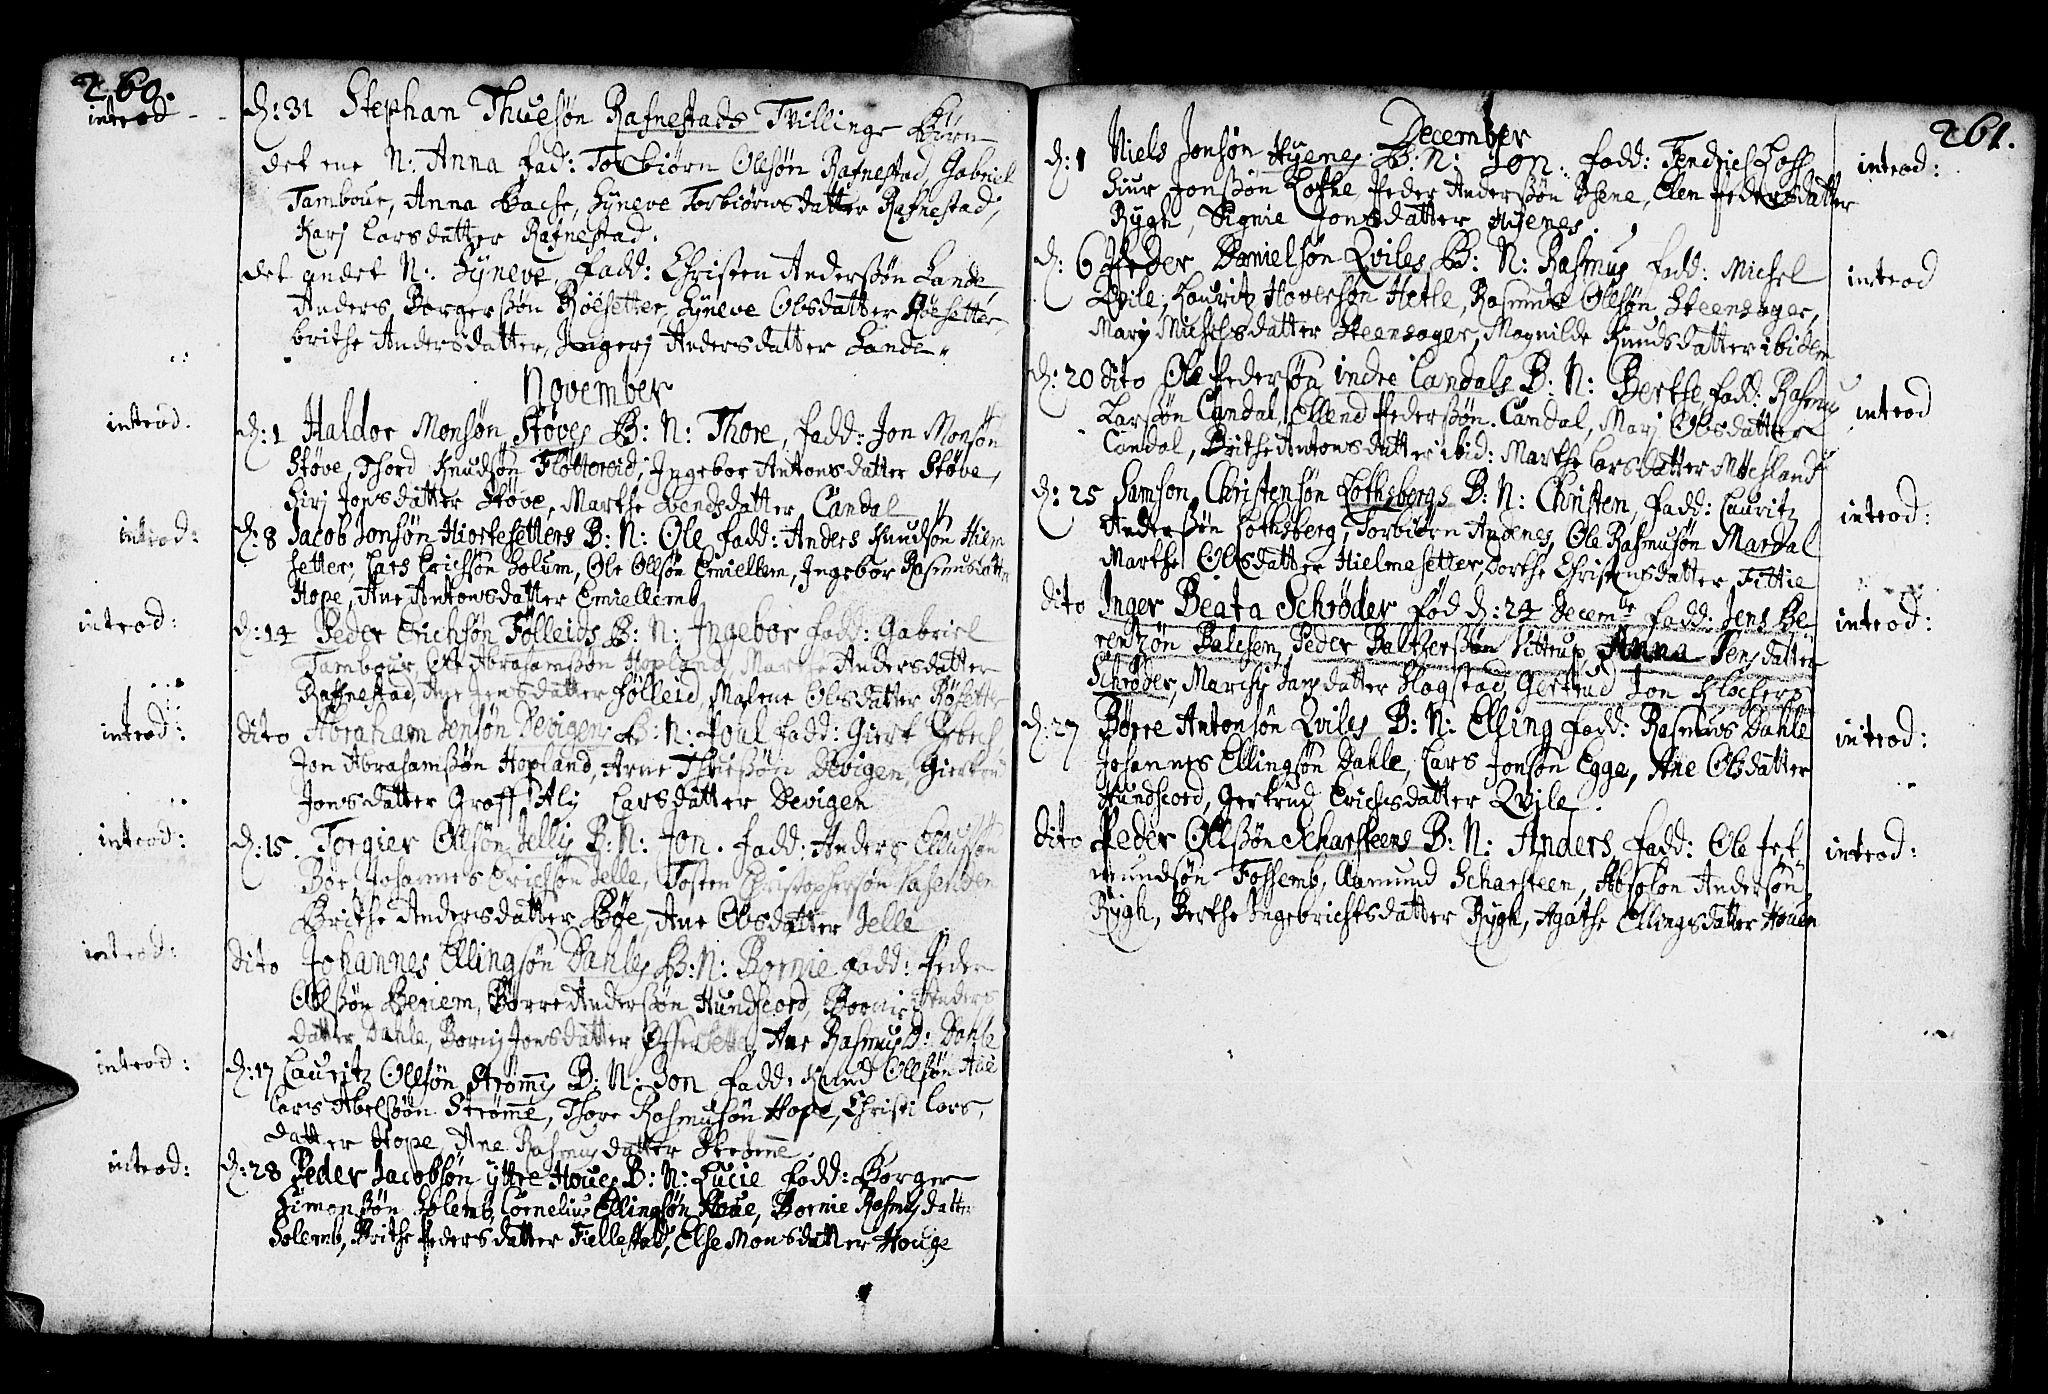 SAB, Gloppen Sokneprestembete, H/Haa/Haaa/L0001: Ministerialbok nr. A 1, 1686-1711, s. 260-261